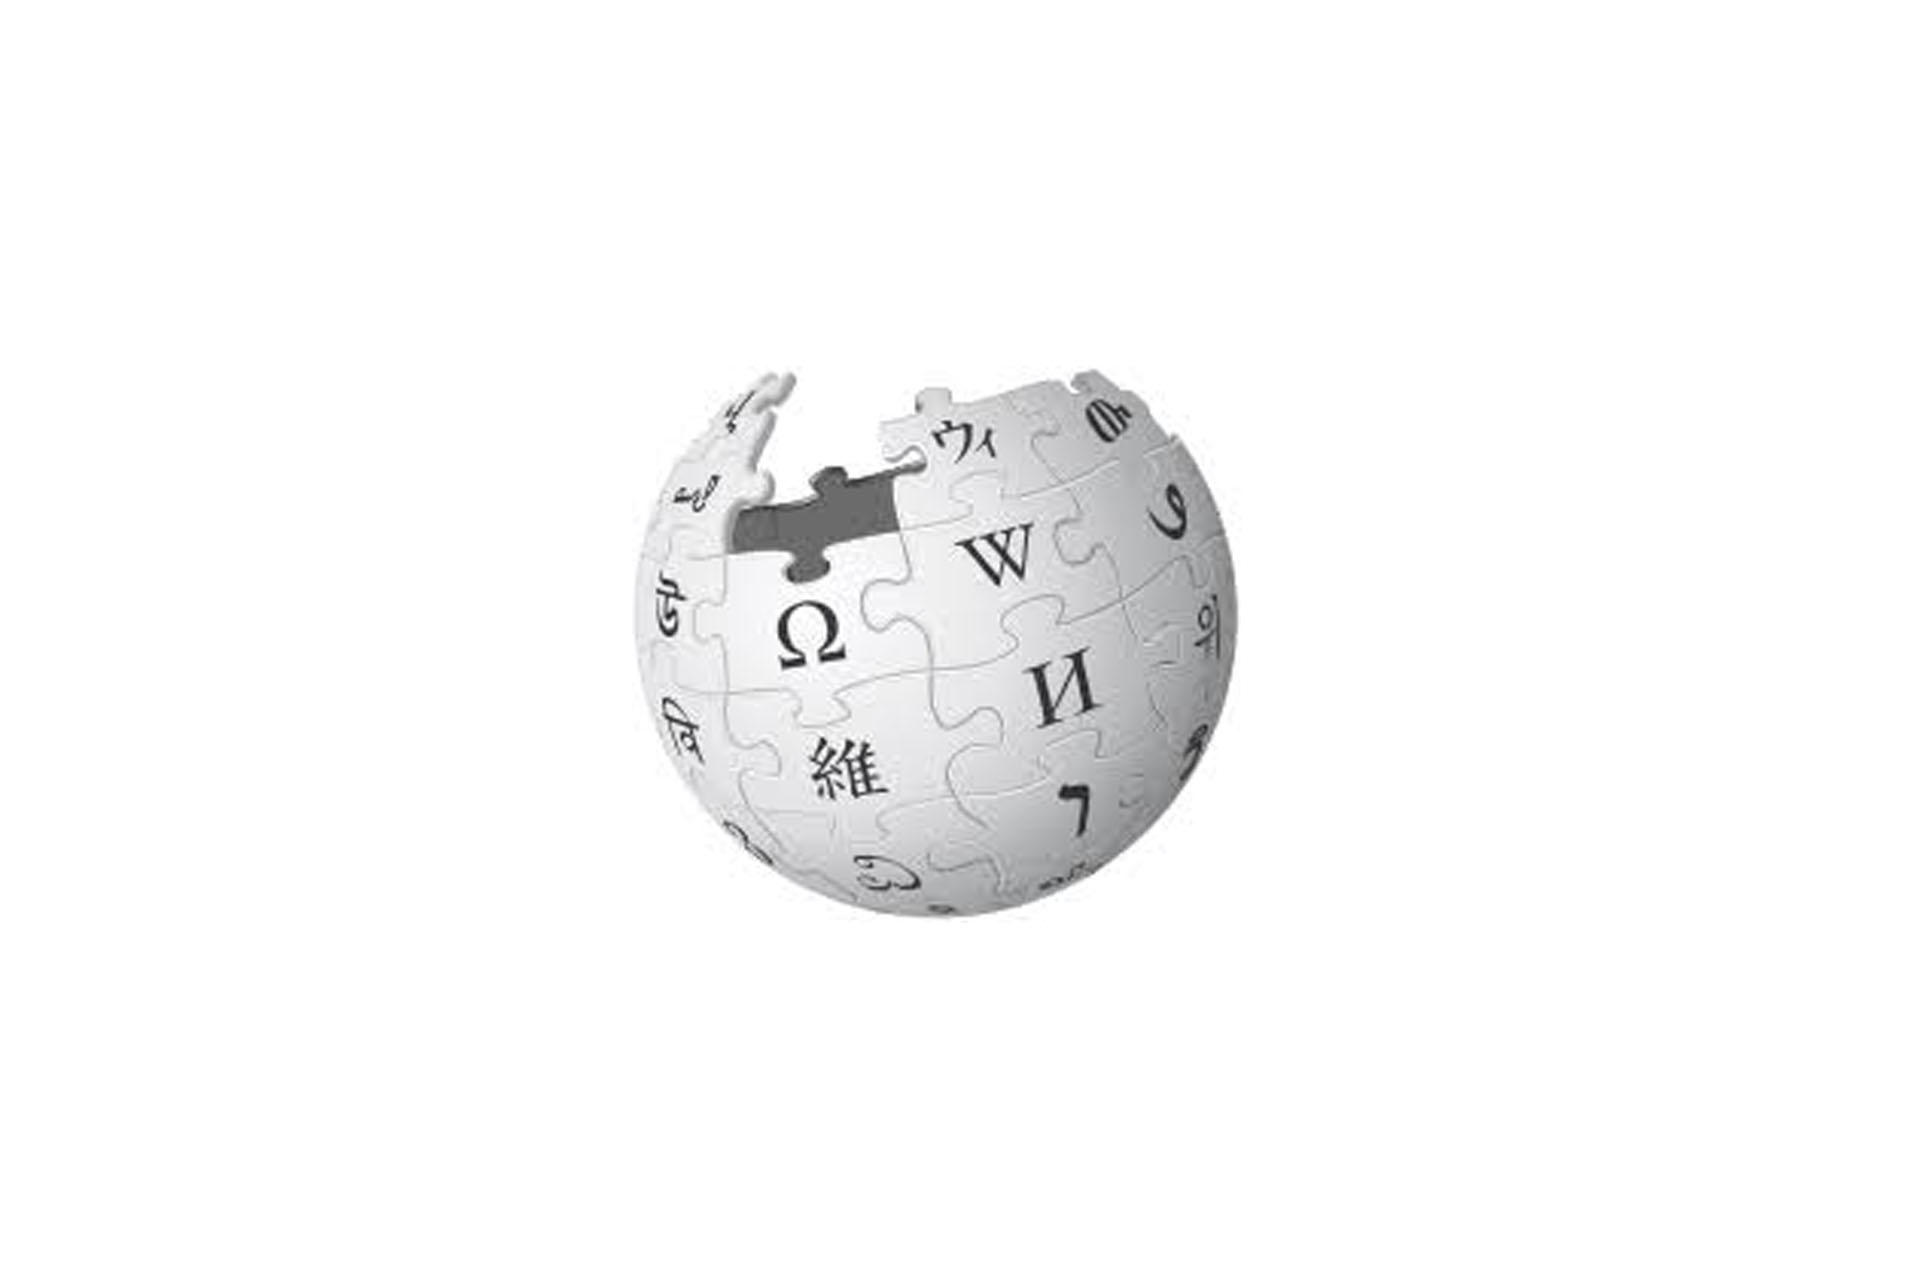 YouTube agregará información de Wikipedia a videos sobre conspiraciones